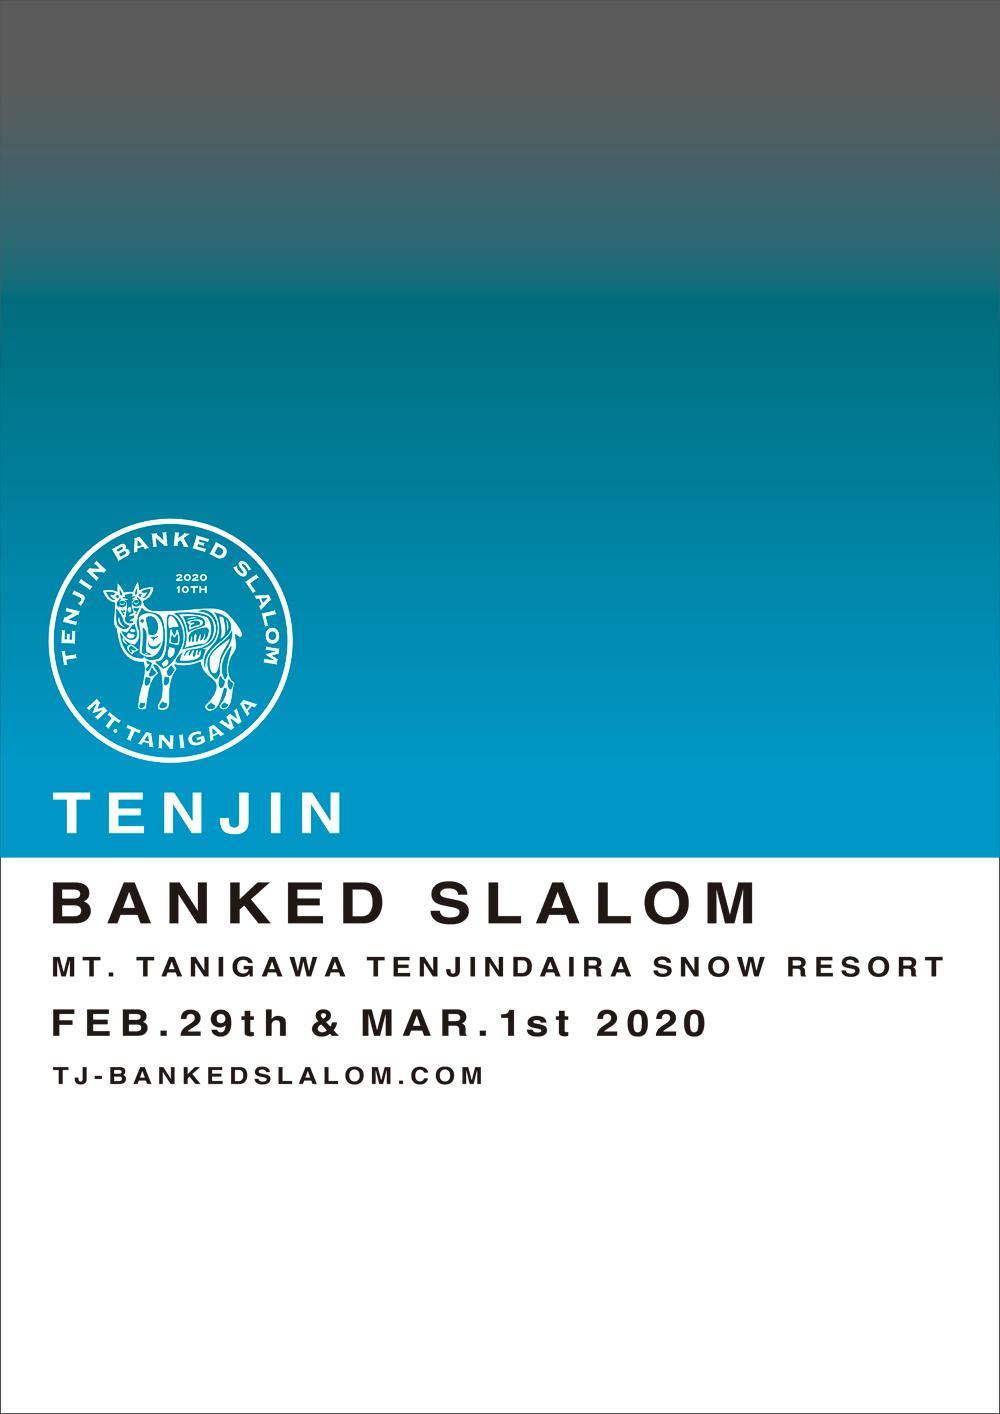 TENJIN BANKED SLALOM  バンクドスラローム